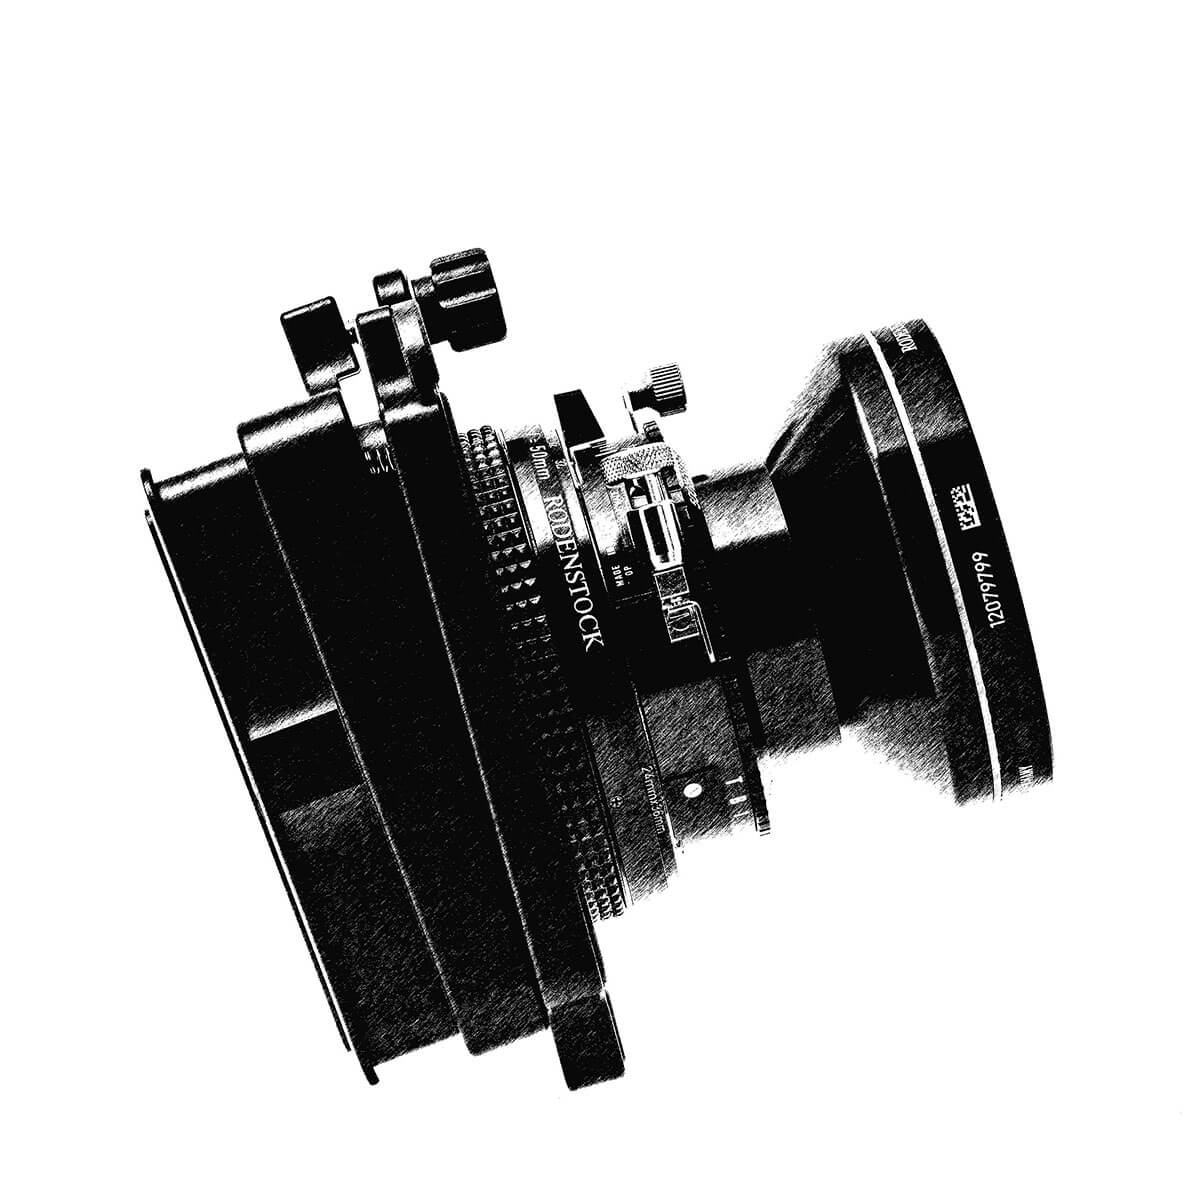 ALPA Macro and Multifunctional Adapters